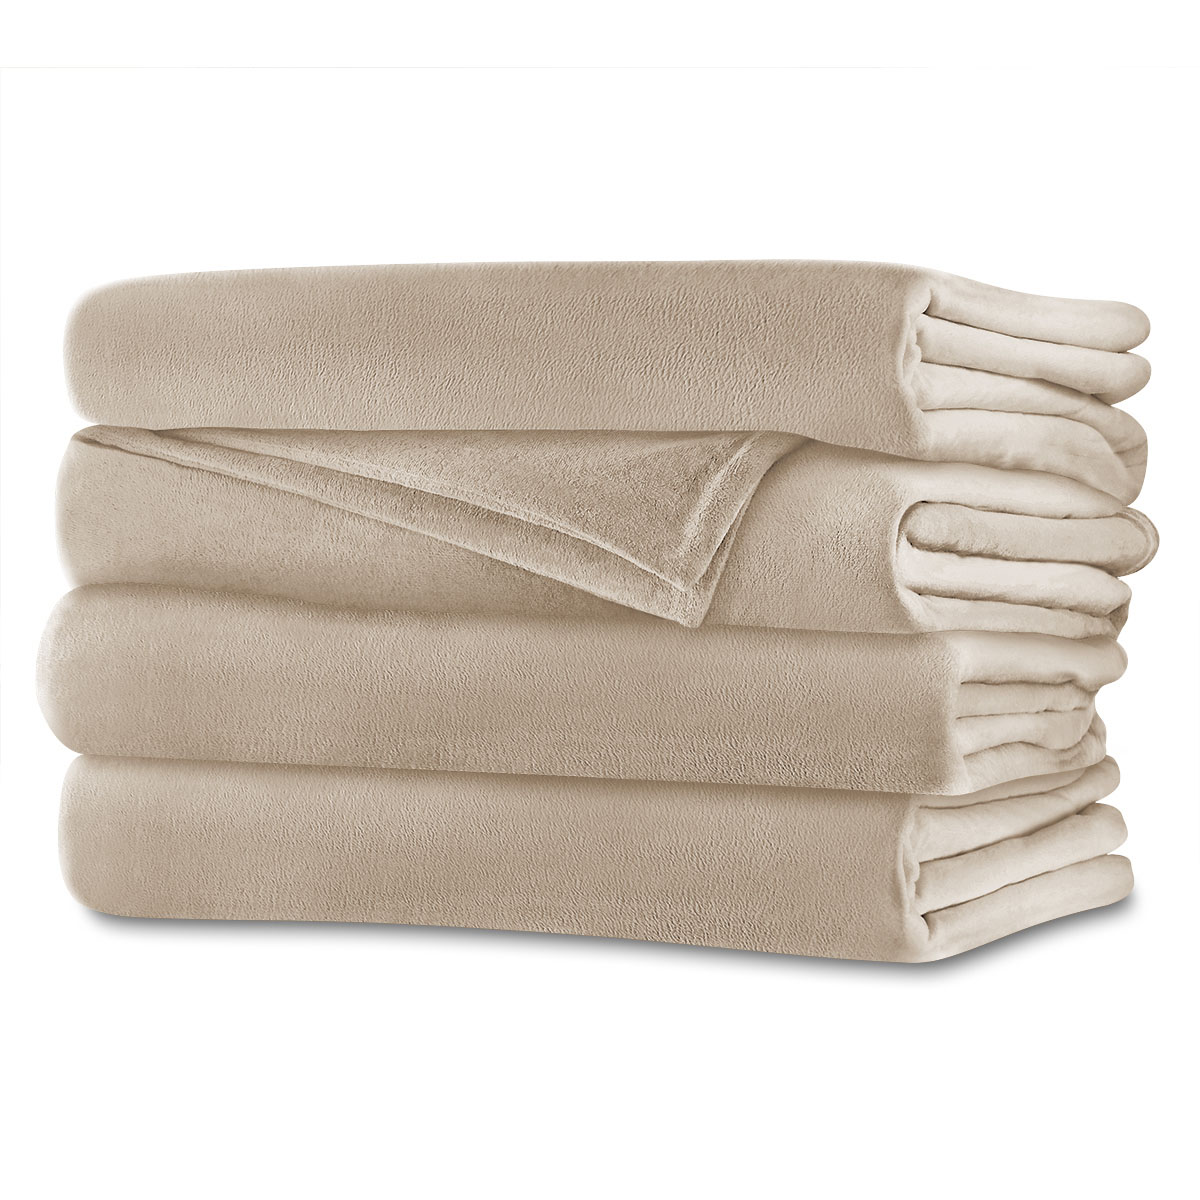 Sunbeam® Full/Queen RoyalMink™ Heated Blanket, ...